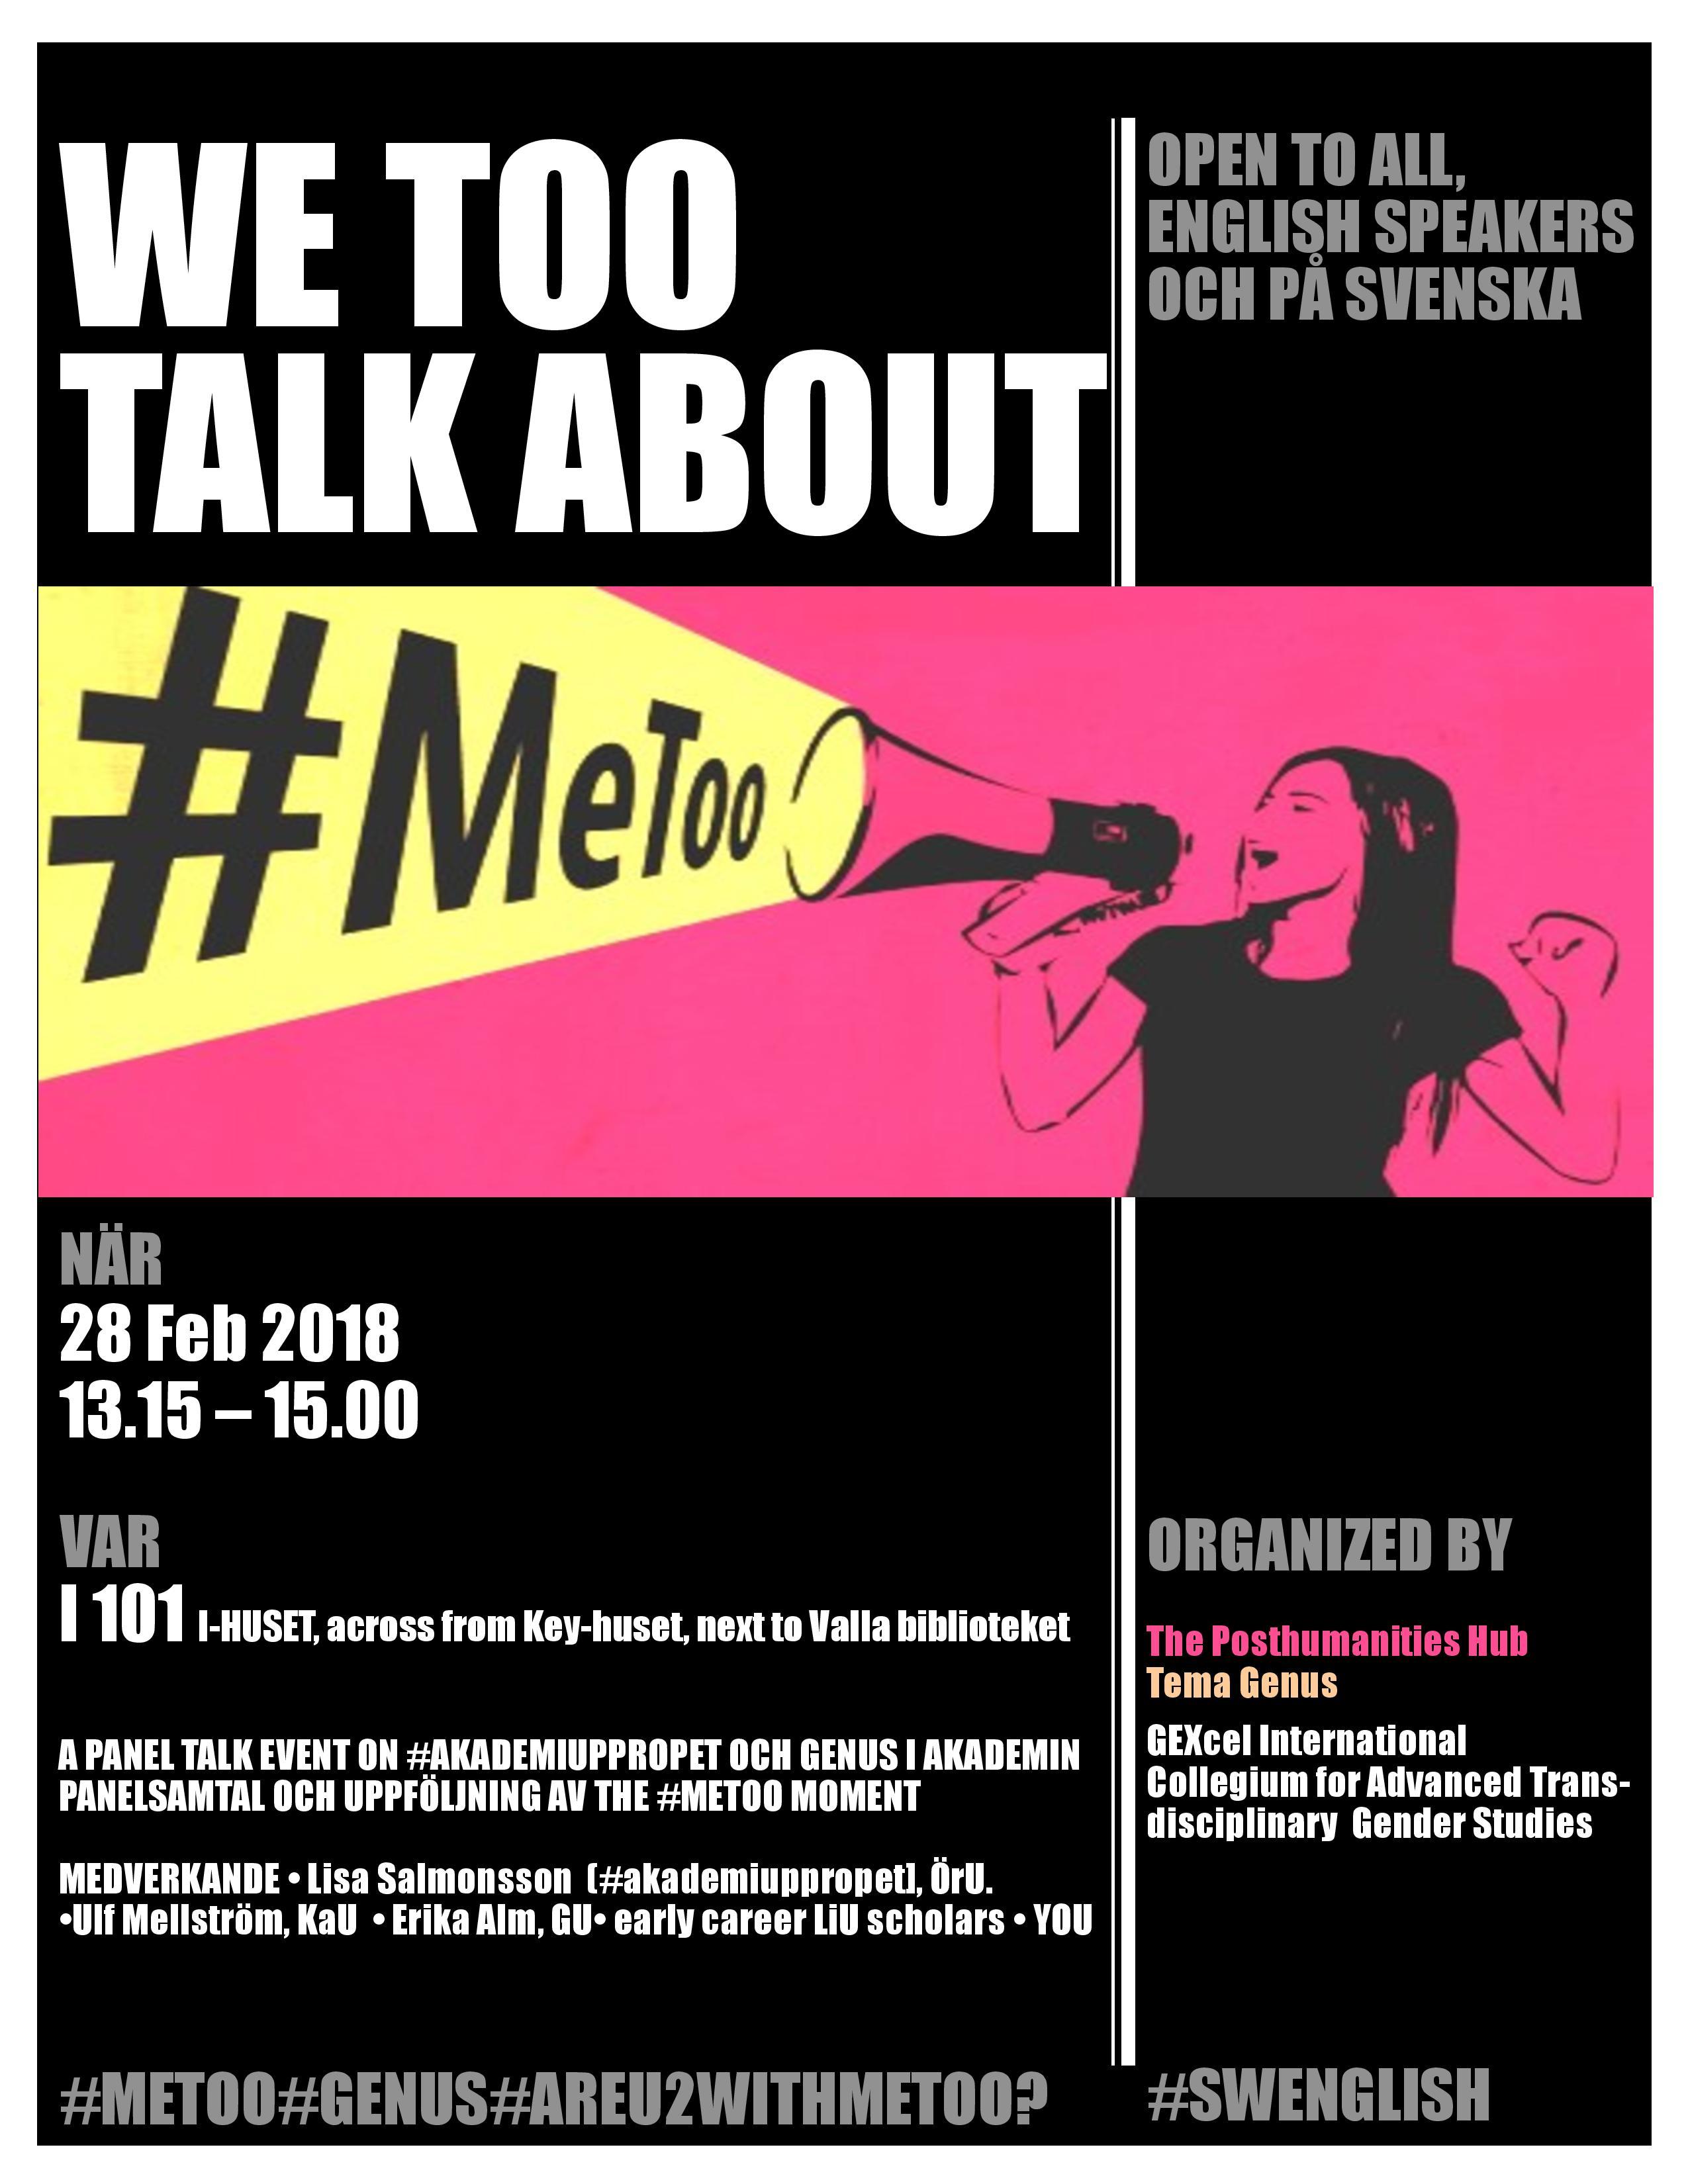 metoo event 28th Feb LiU